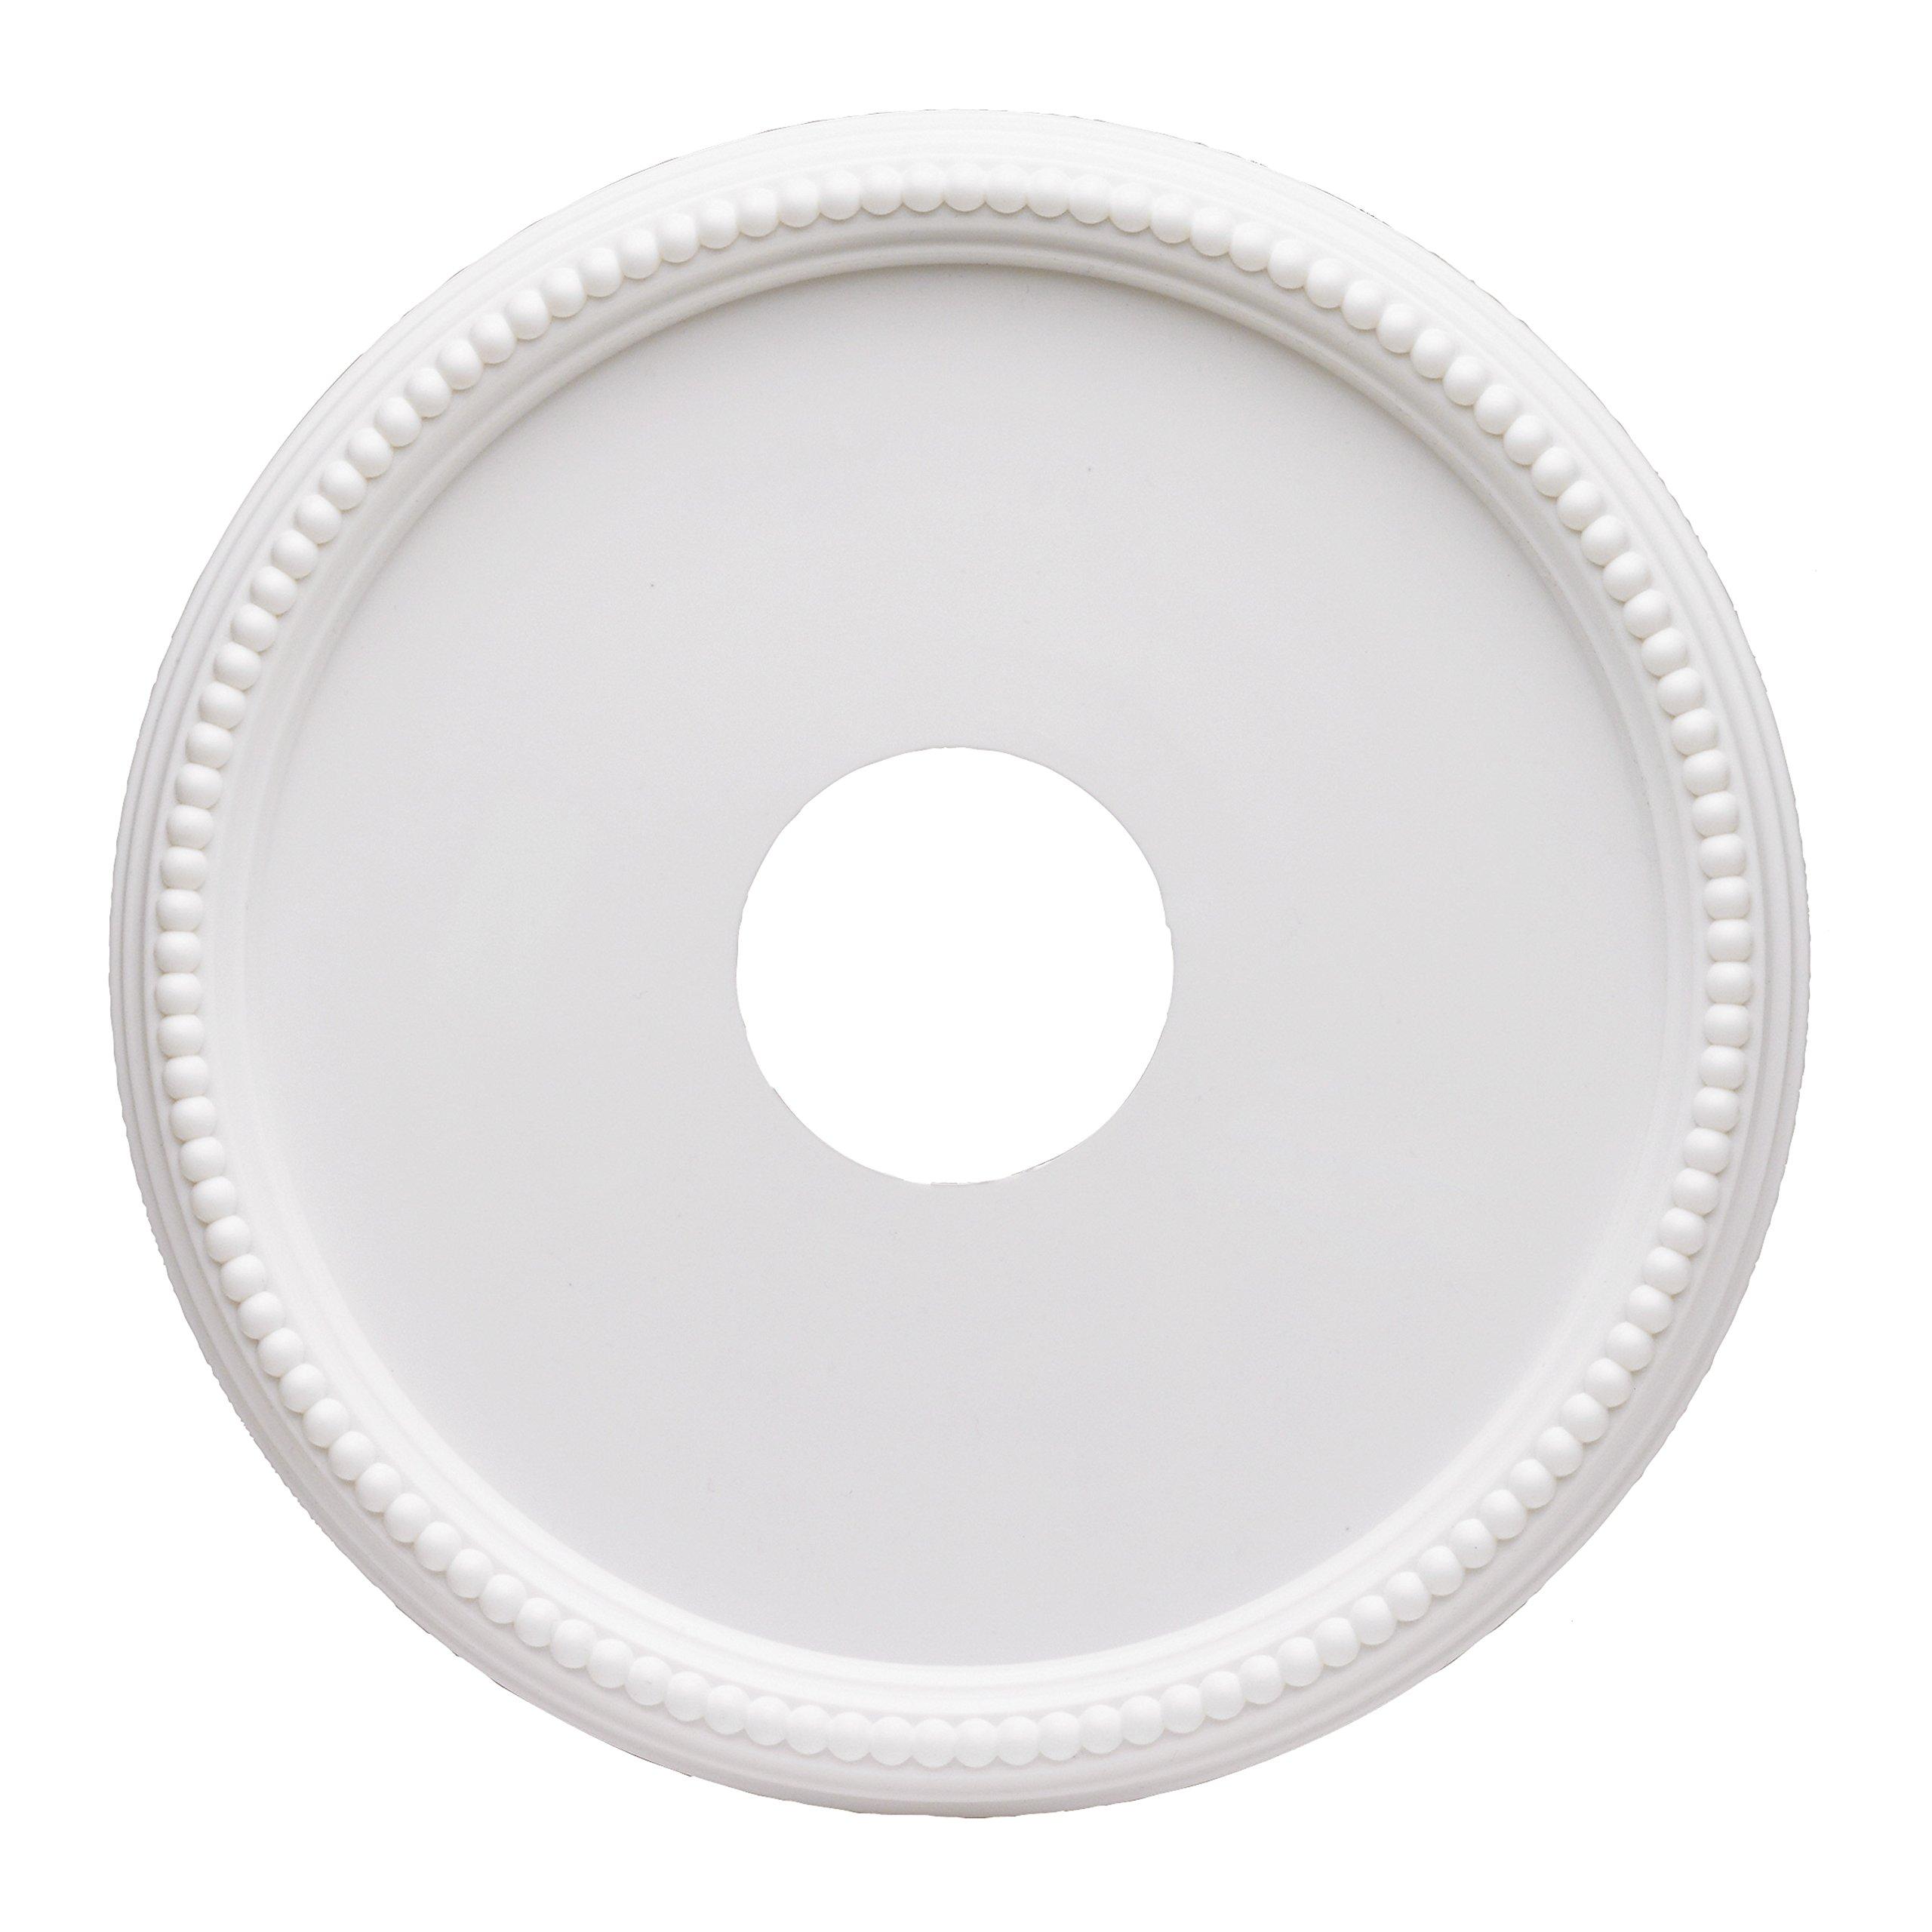 Westinghouse 7773300 15-3/4-Inch Round Beaded White Finish Ceiling Medallion